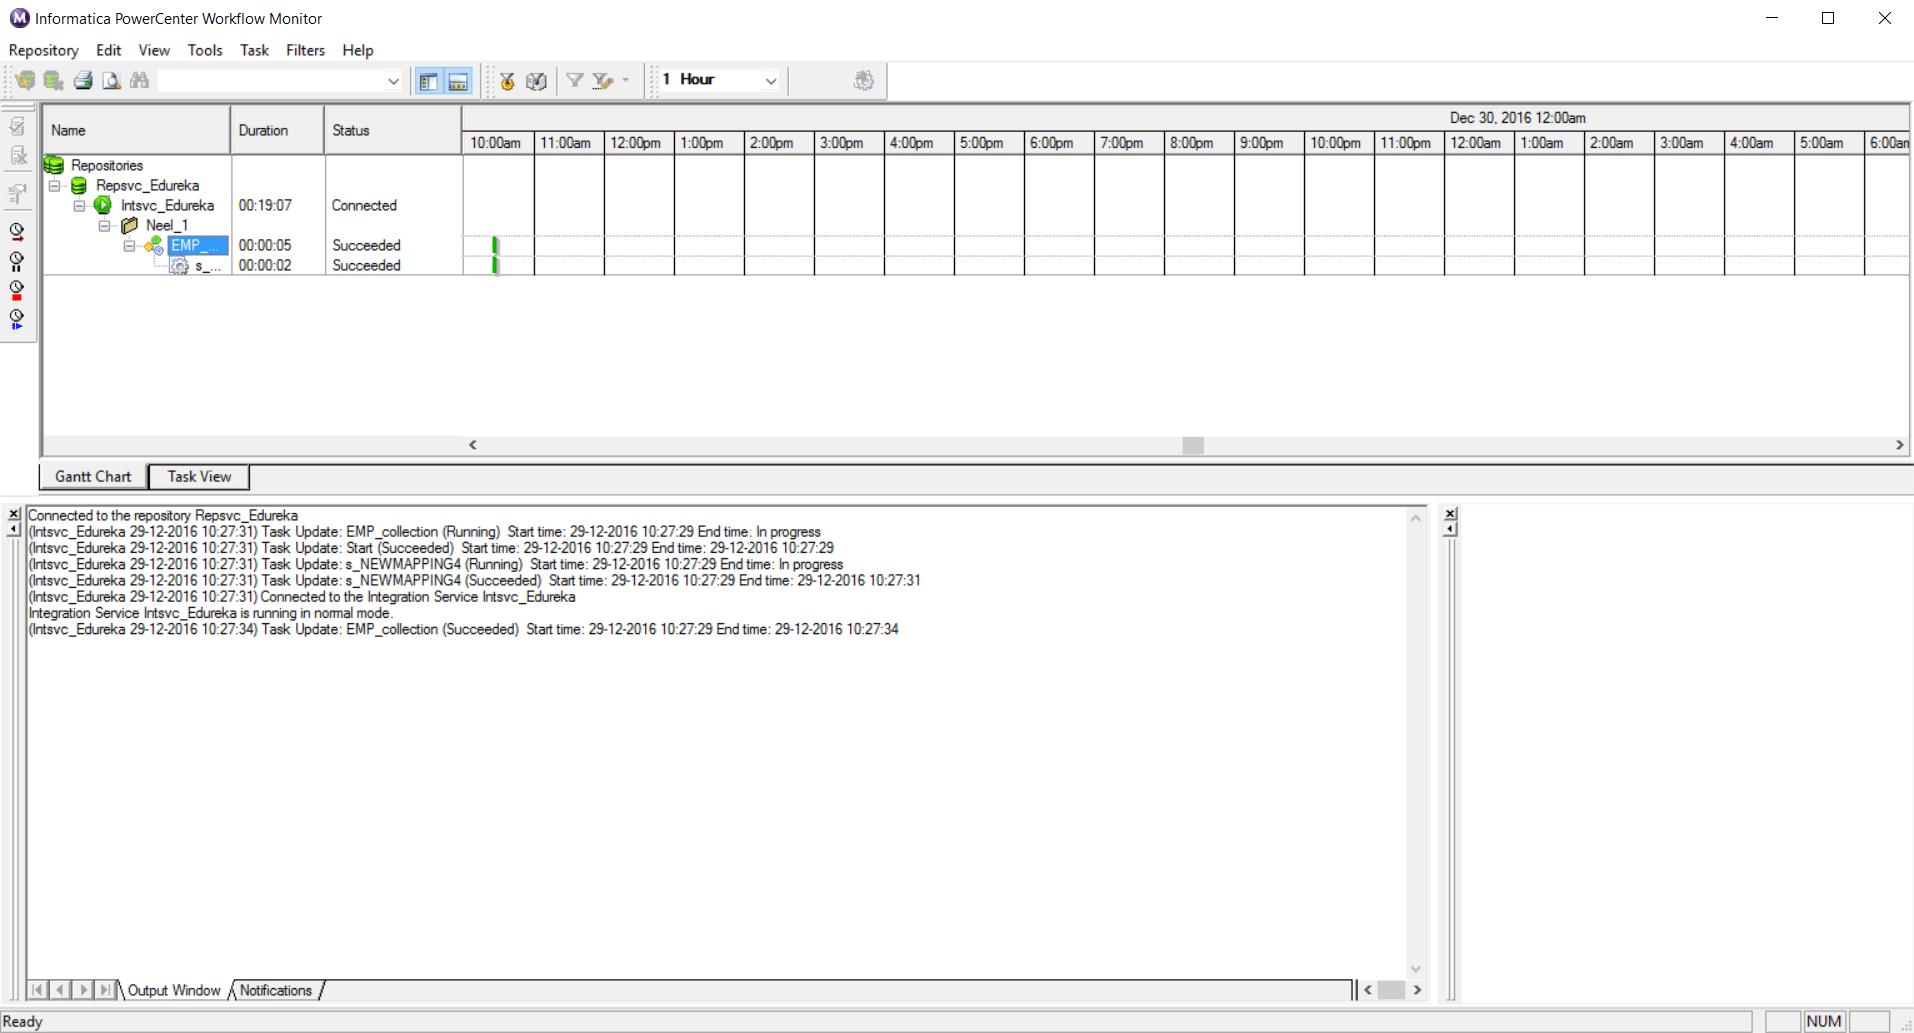 Workflow Moniter - Informatica ETL - Edureka